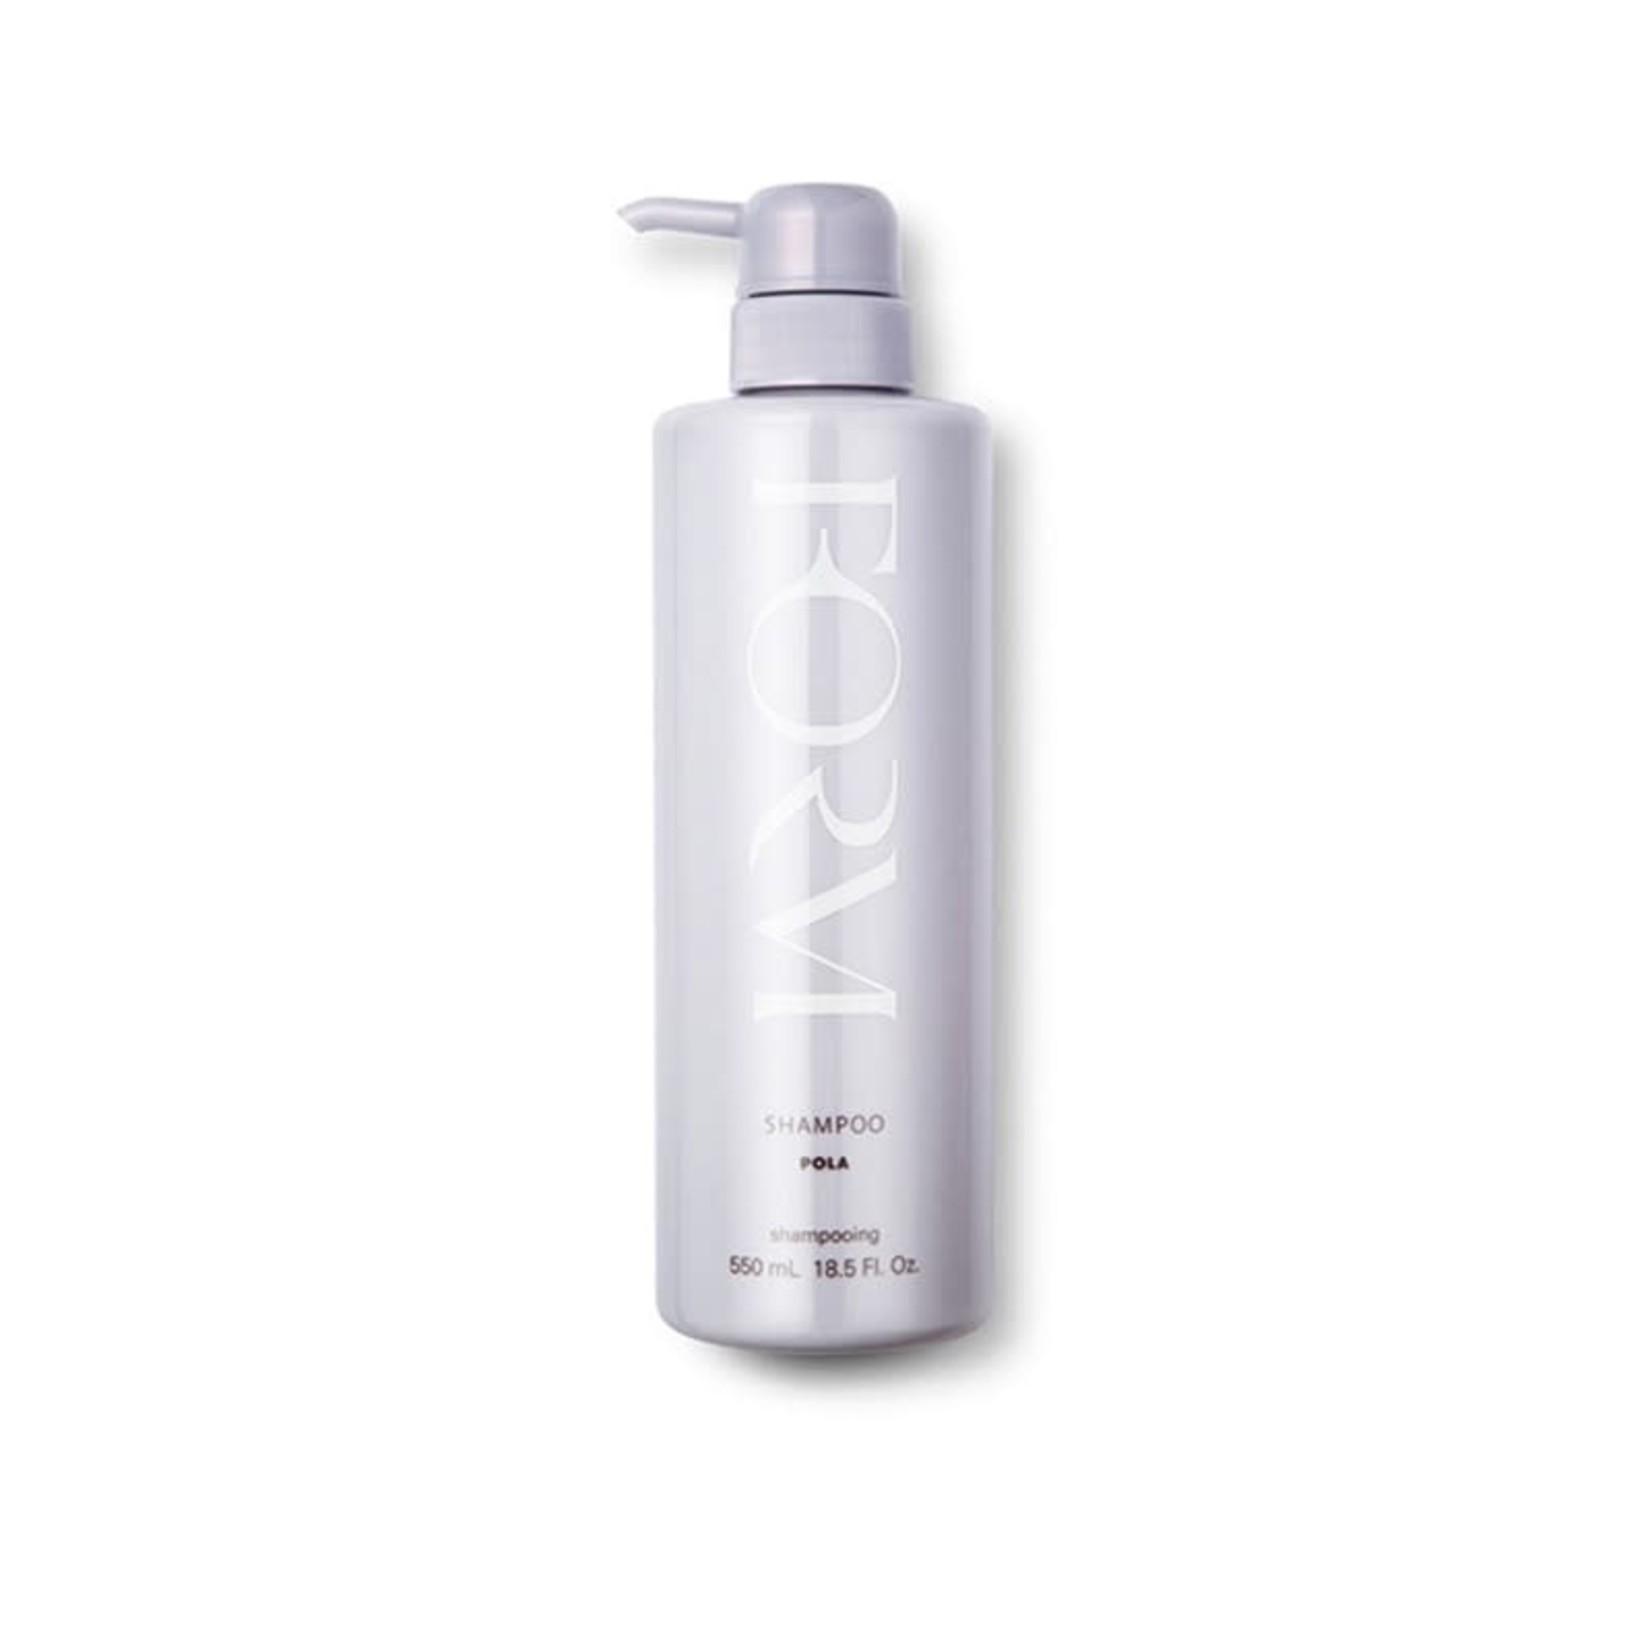 Pola Pola Form Shampoo 550ml